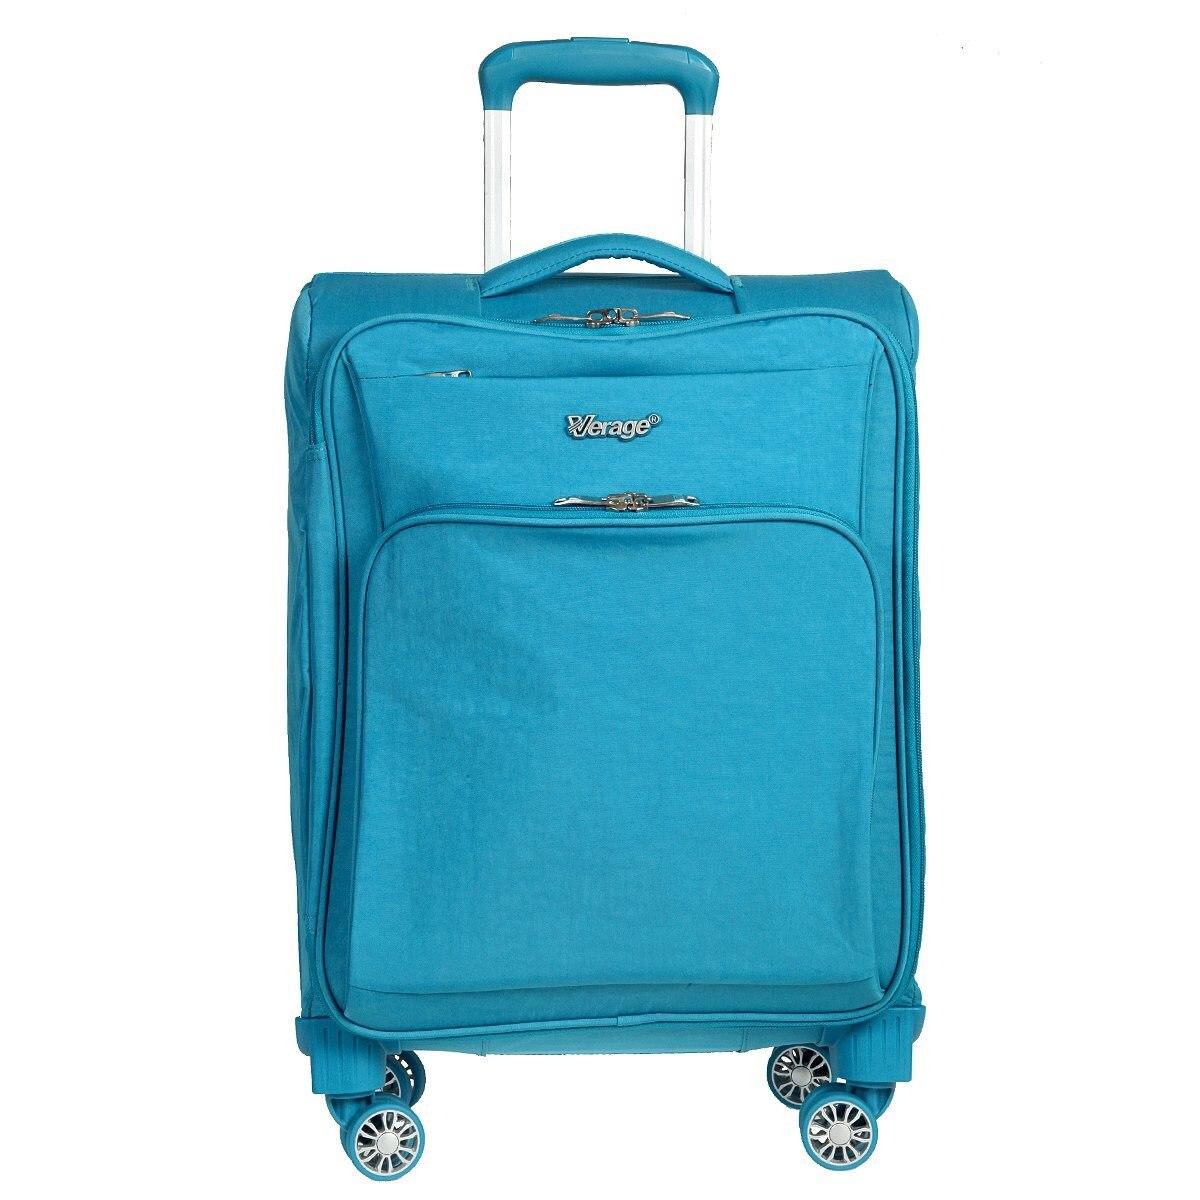 Suitcase-trolley Verage GM15012 W20 blue